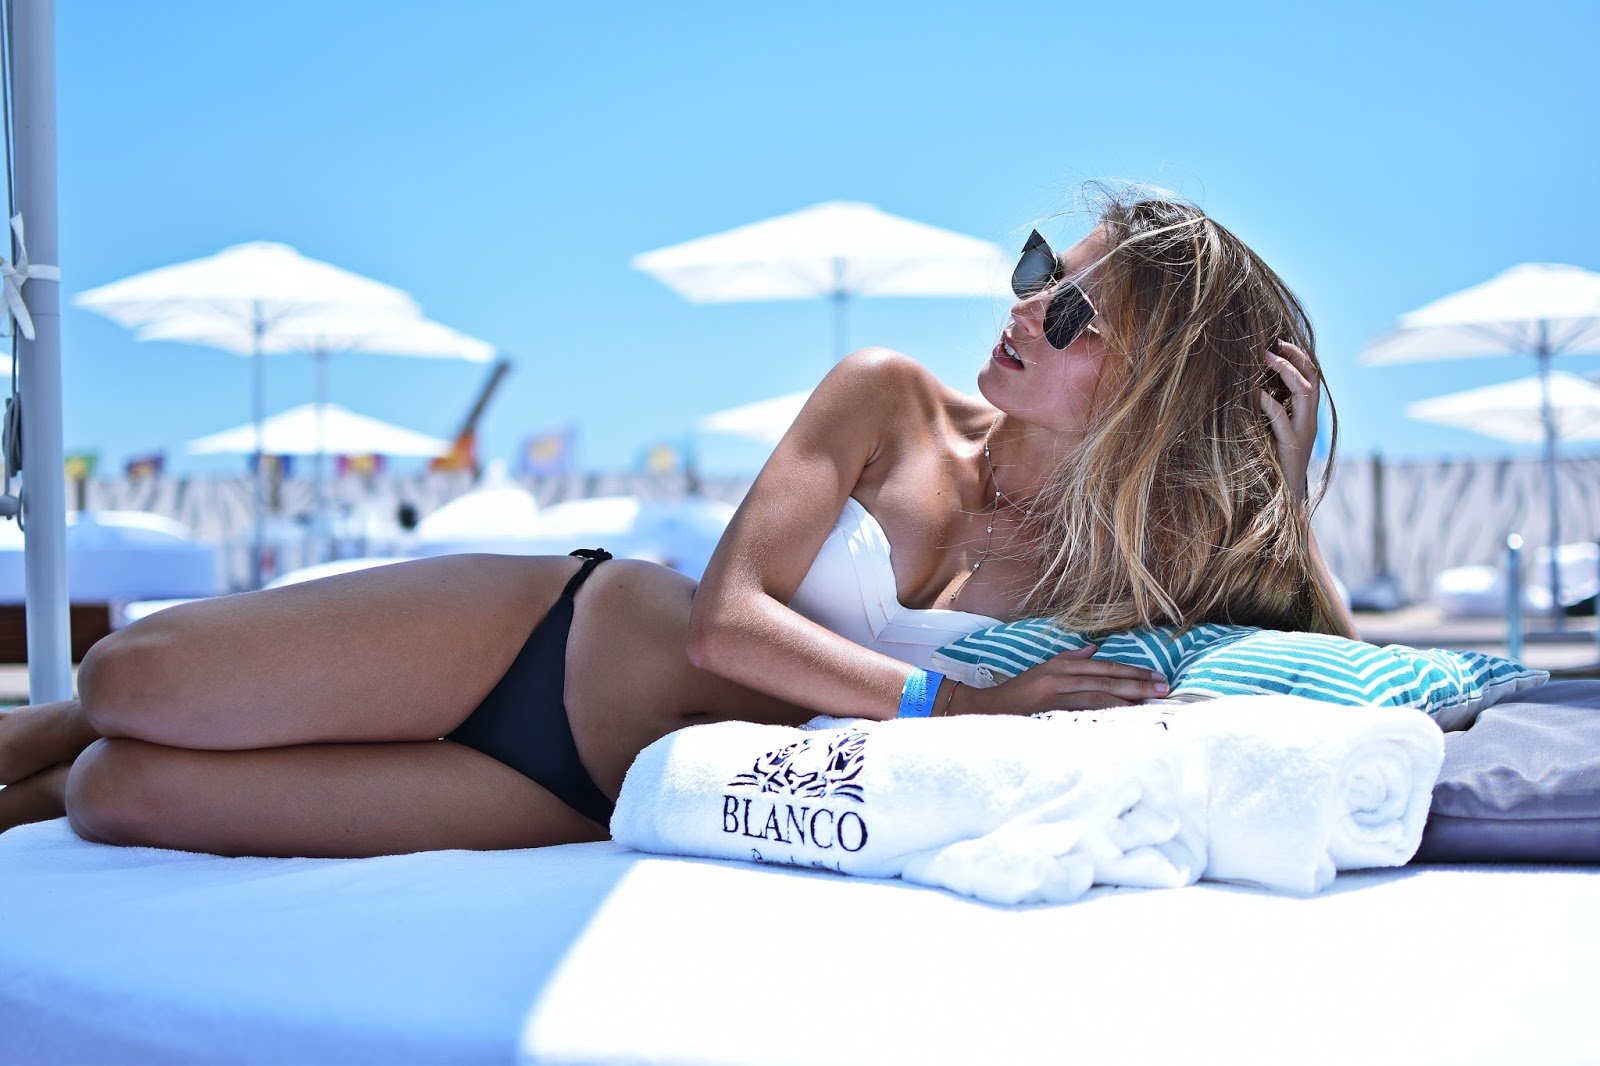 O paraíso | Blanco Beach Club |